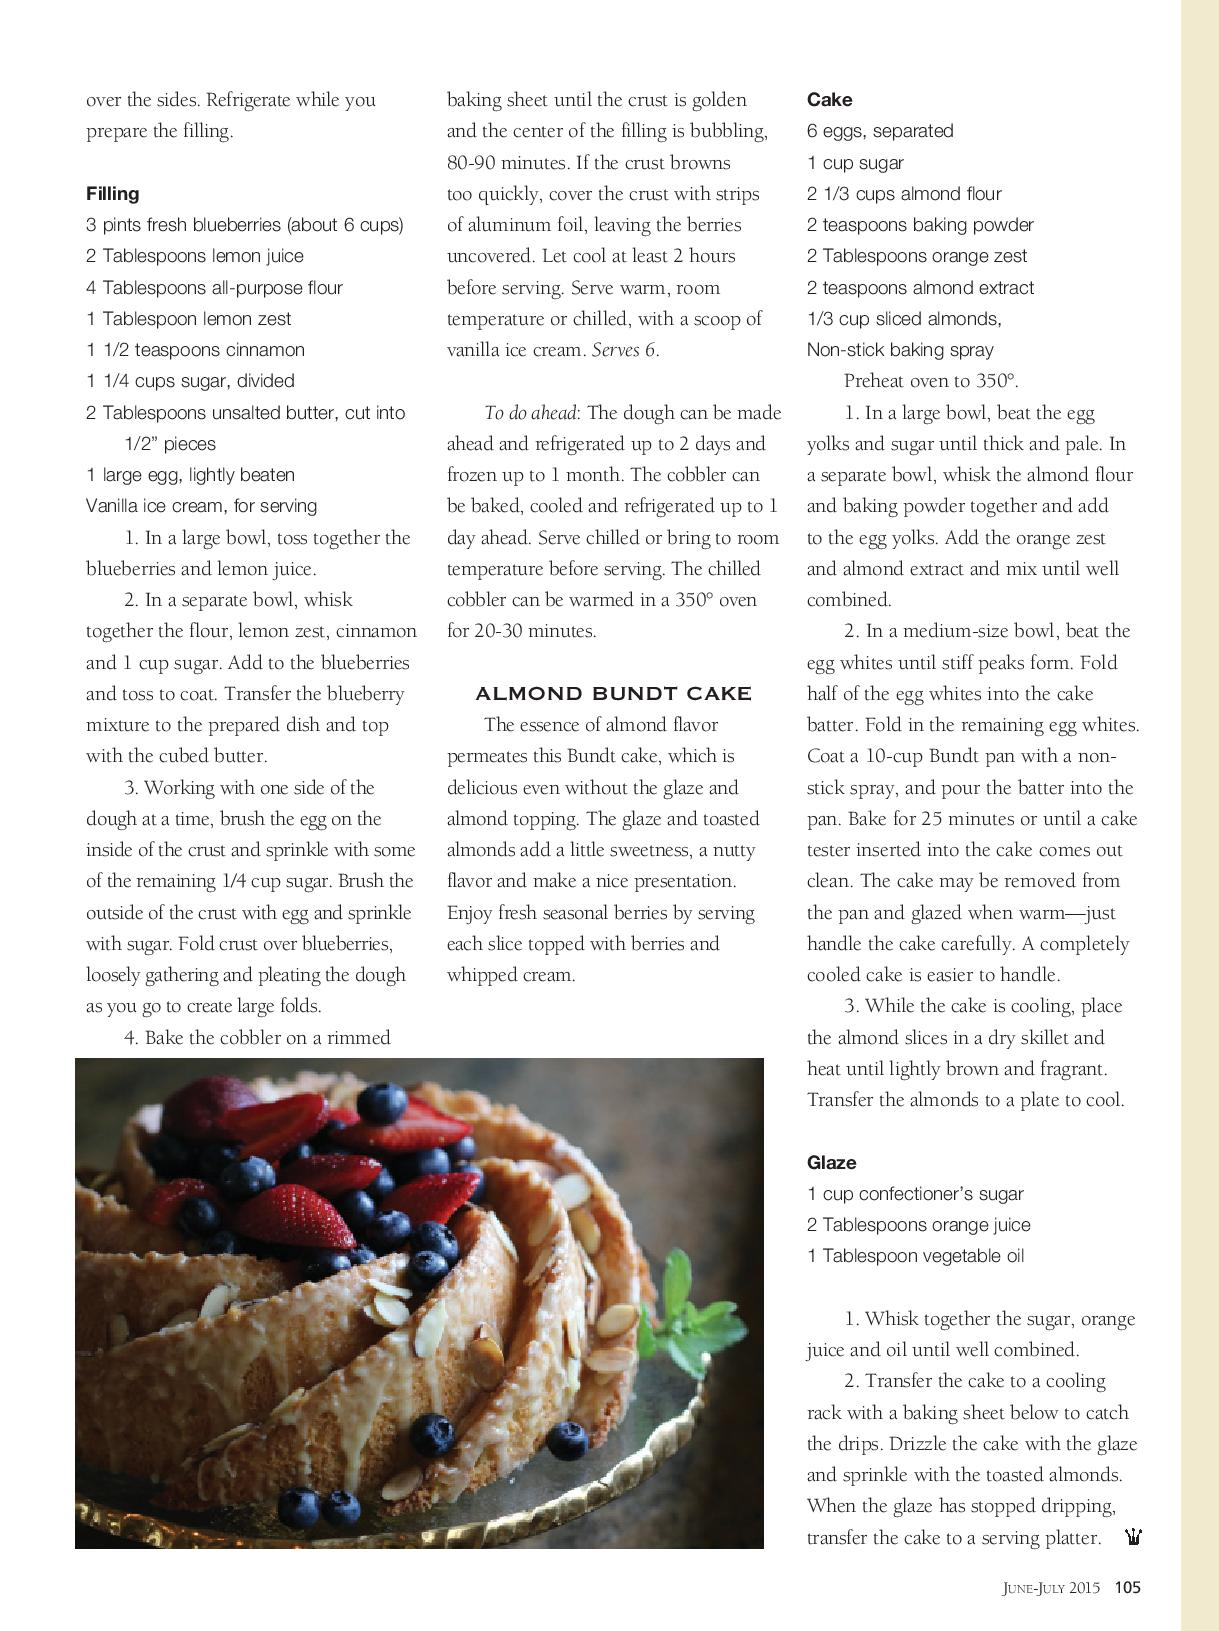 Summertime Desserts-page-002.jpg